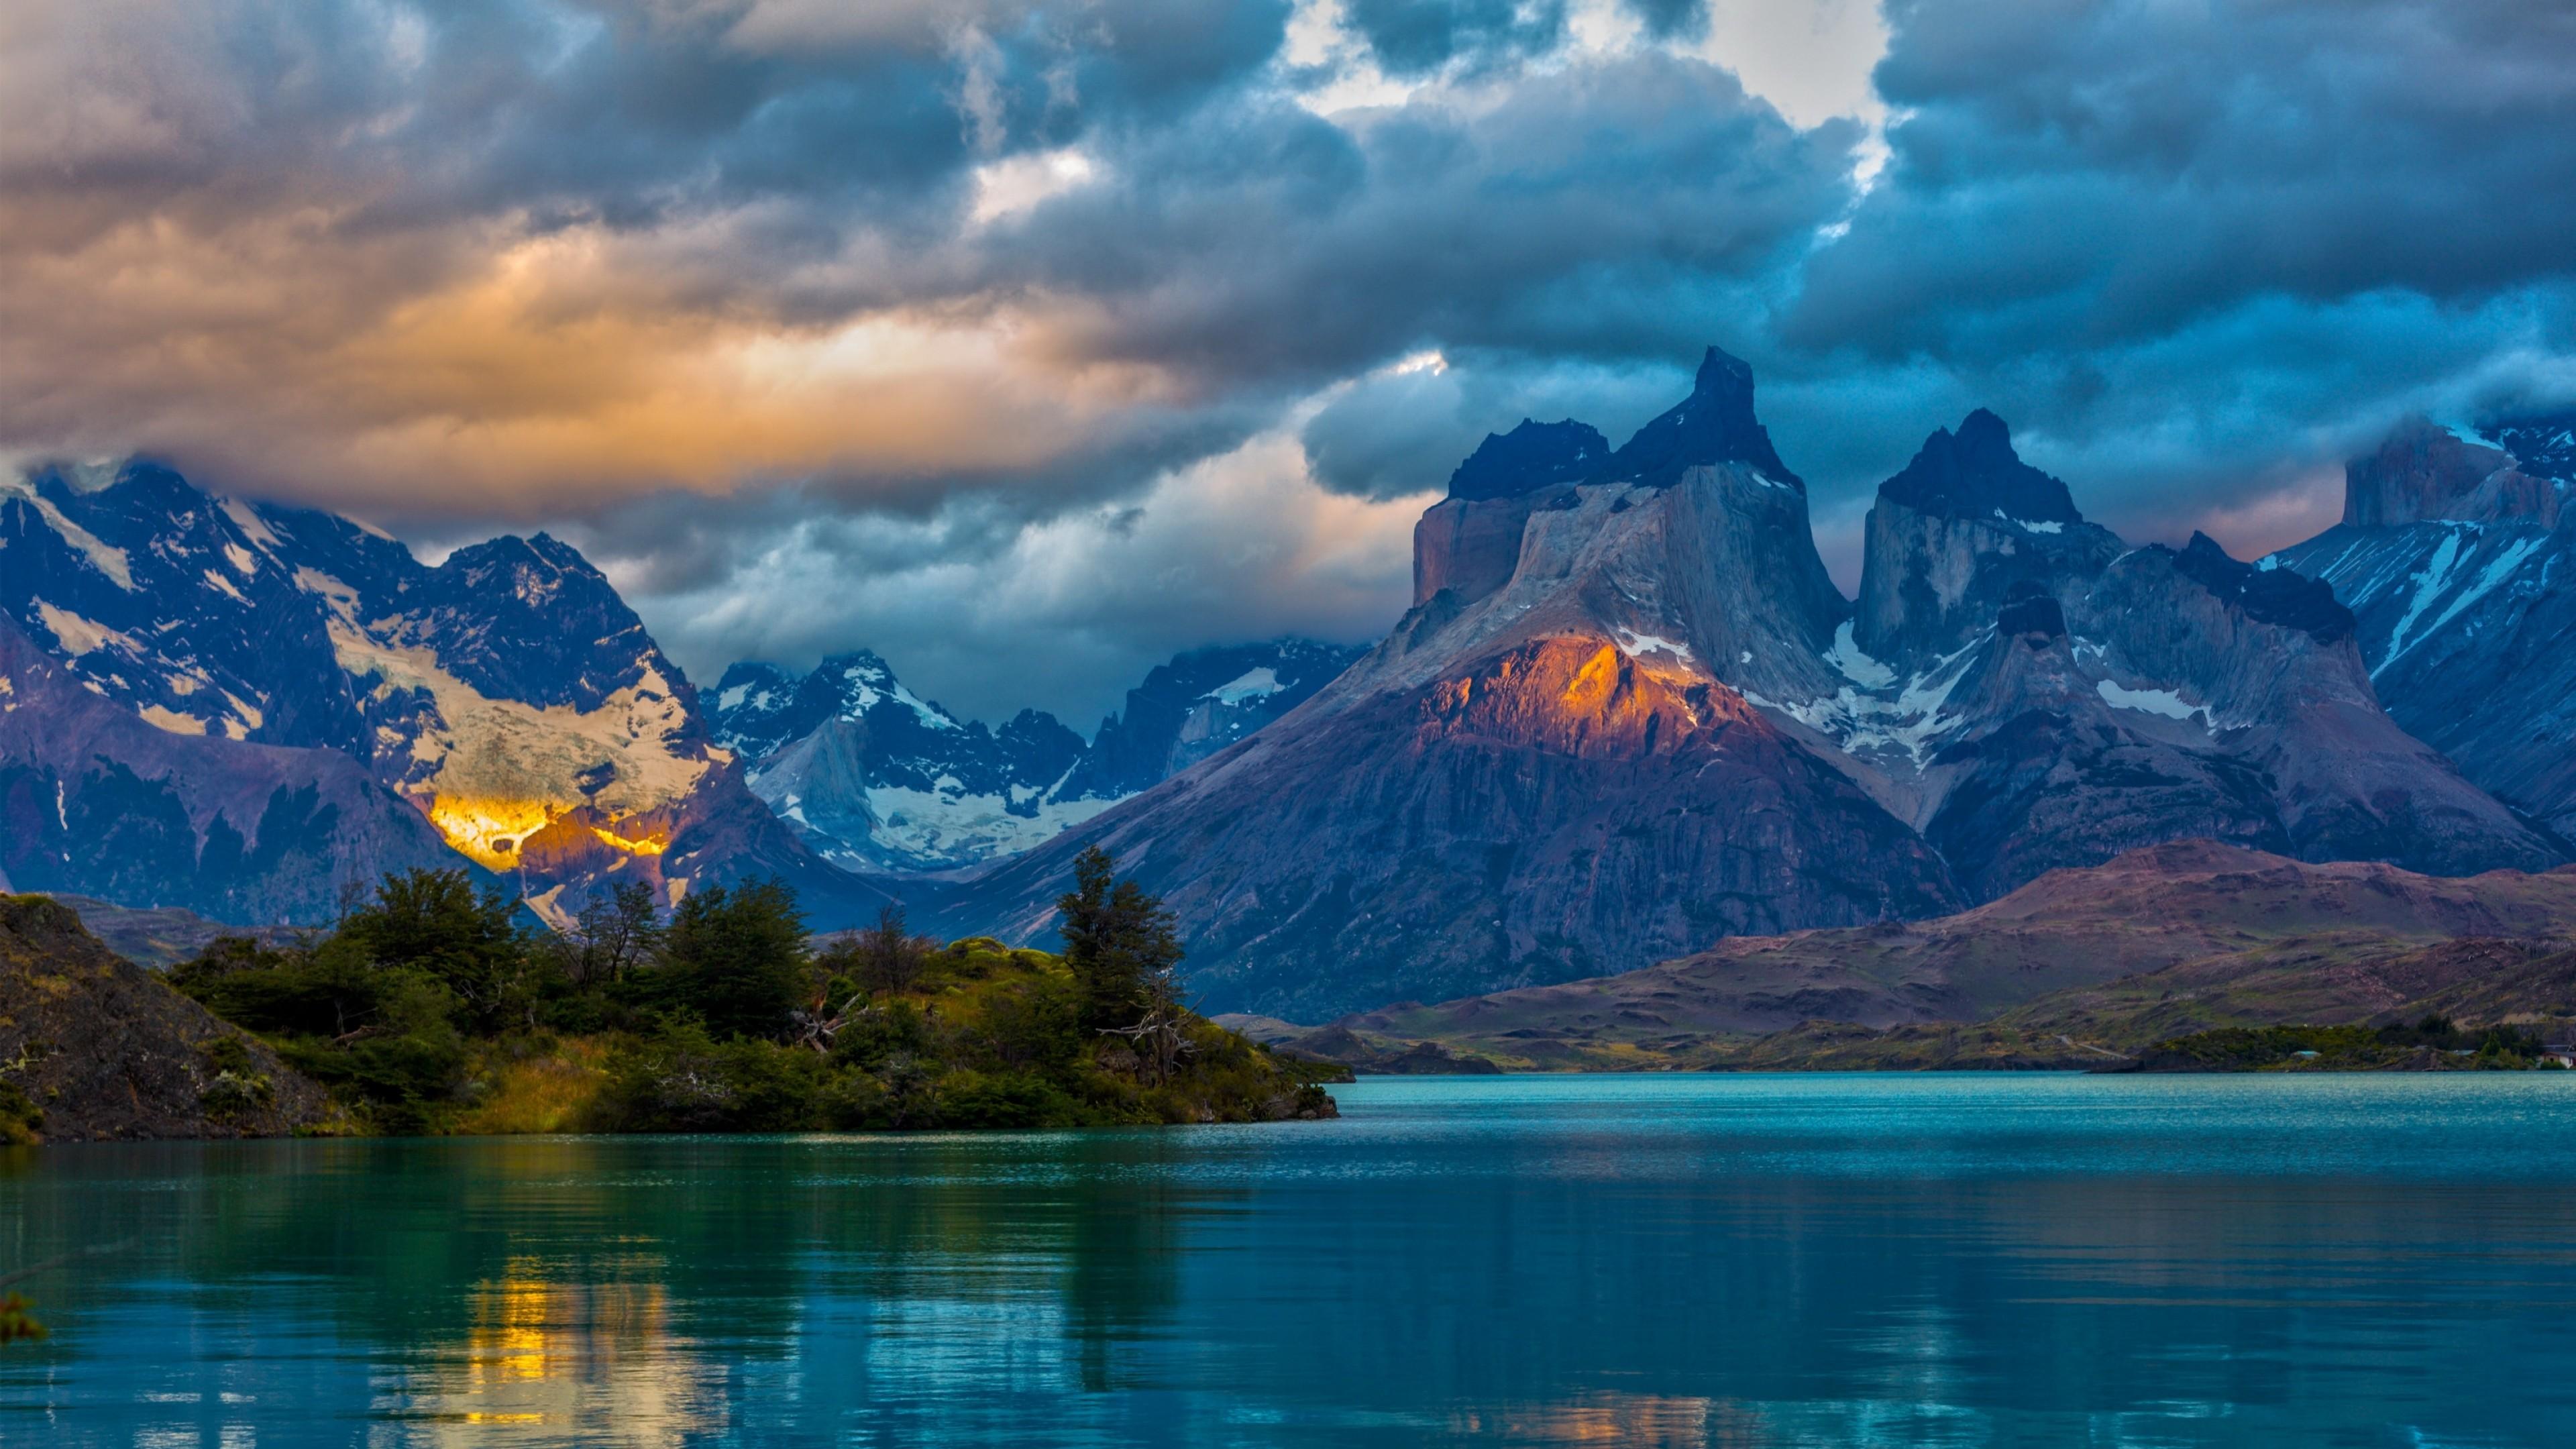 Wallpaper landscape, argentina, mountain, lake, patagonia,  clouds, nature